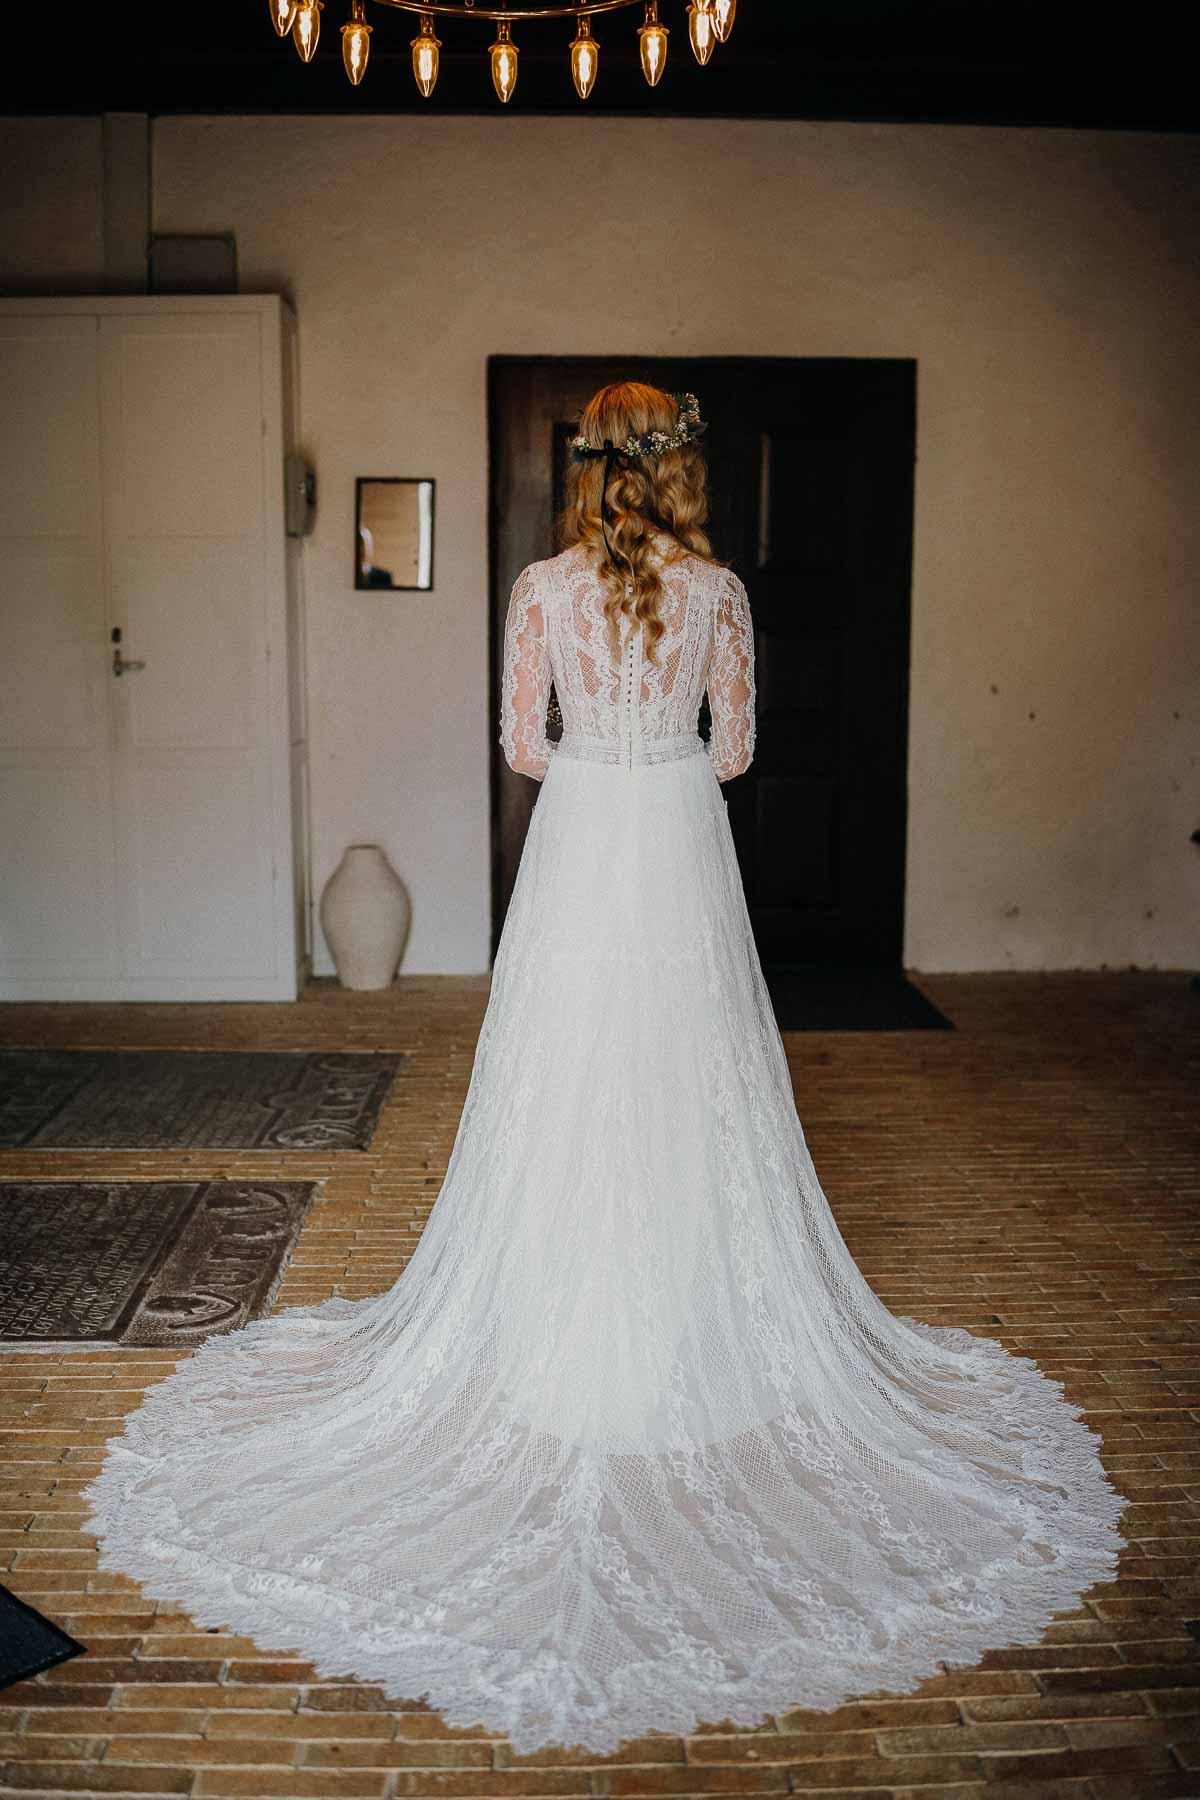 Bryllupsfotograf i Århus - » Professionel Fotografering